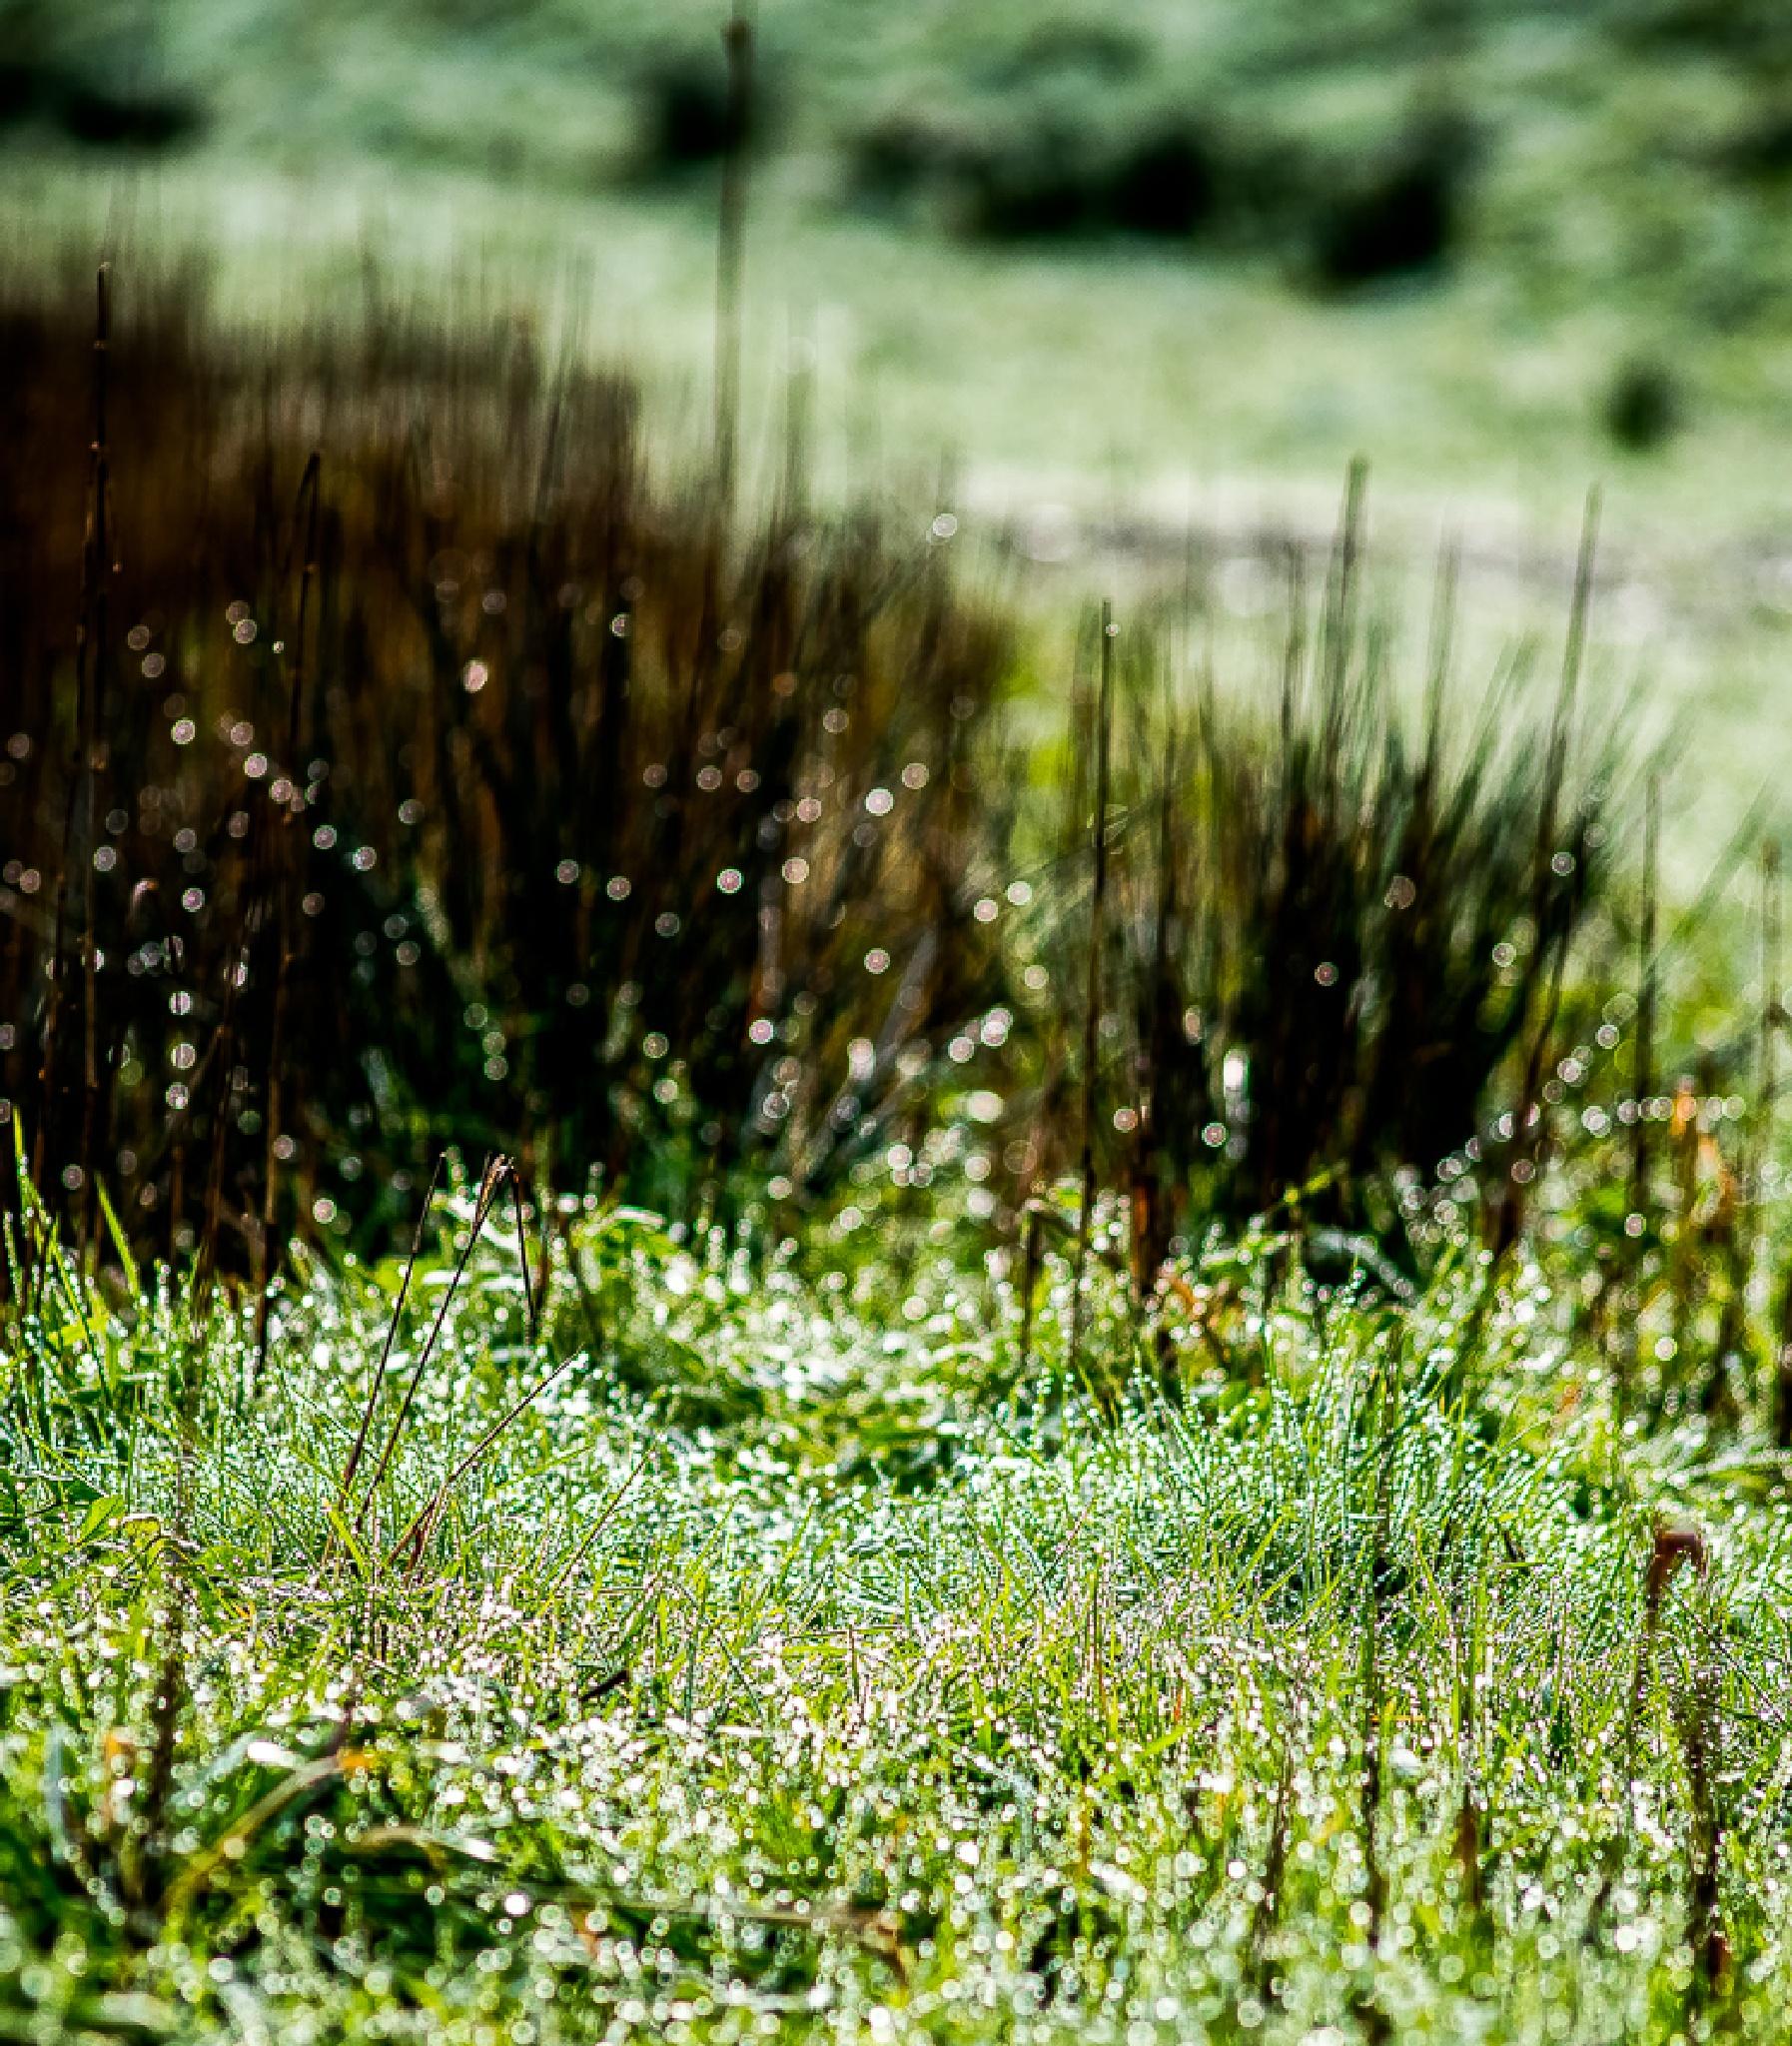 Dewy grass by madchickenwoman